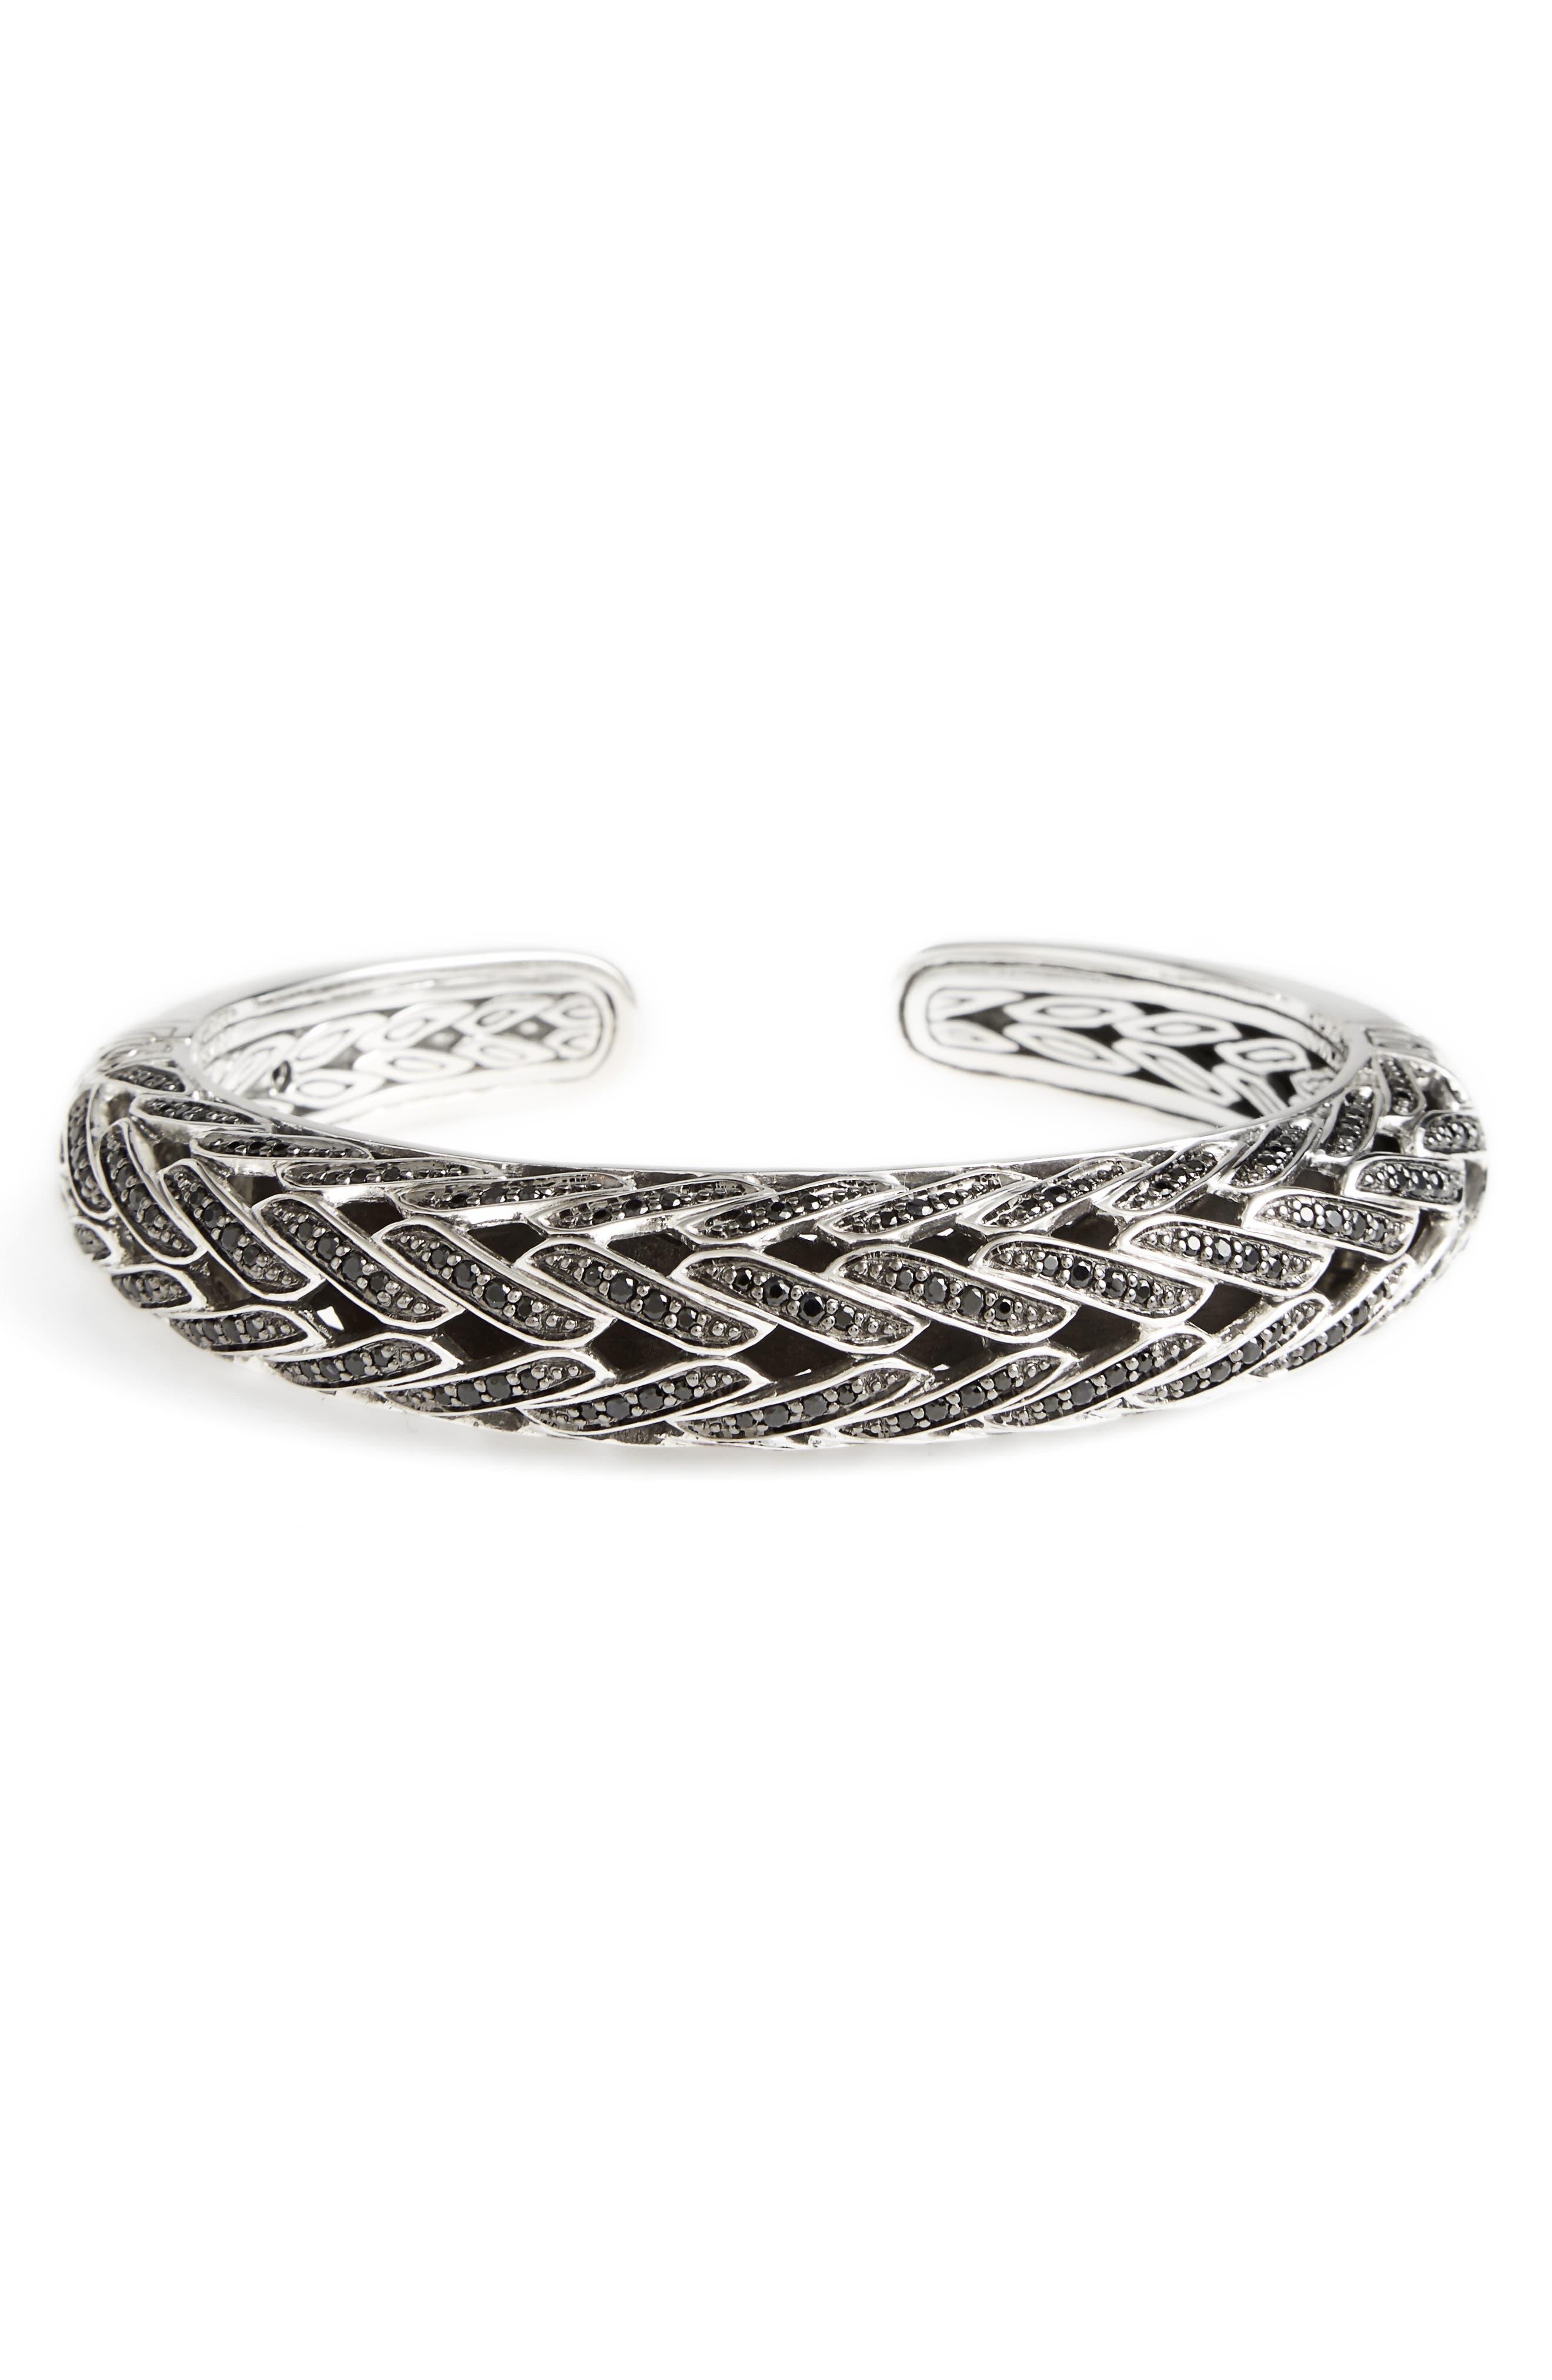 Main Image - John Hardy Classic Chain Spinel Bracelet